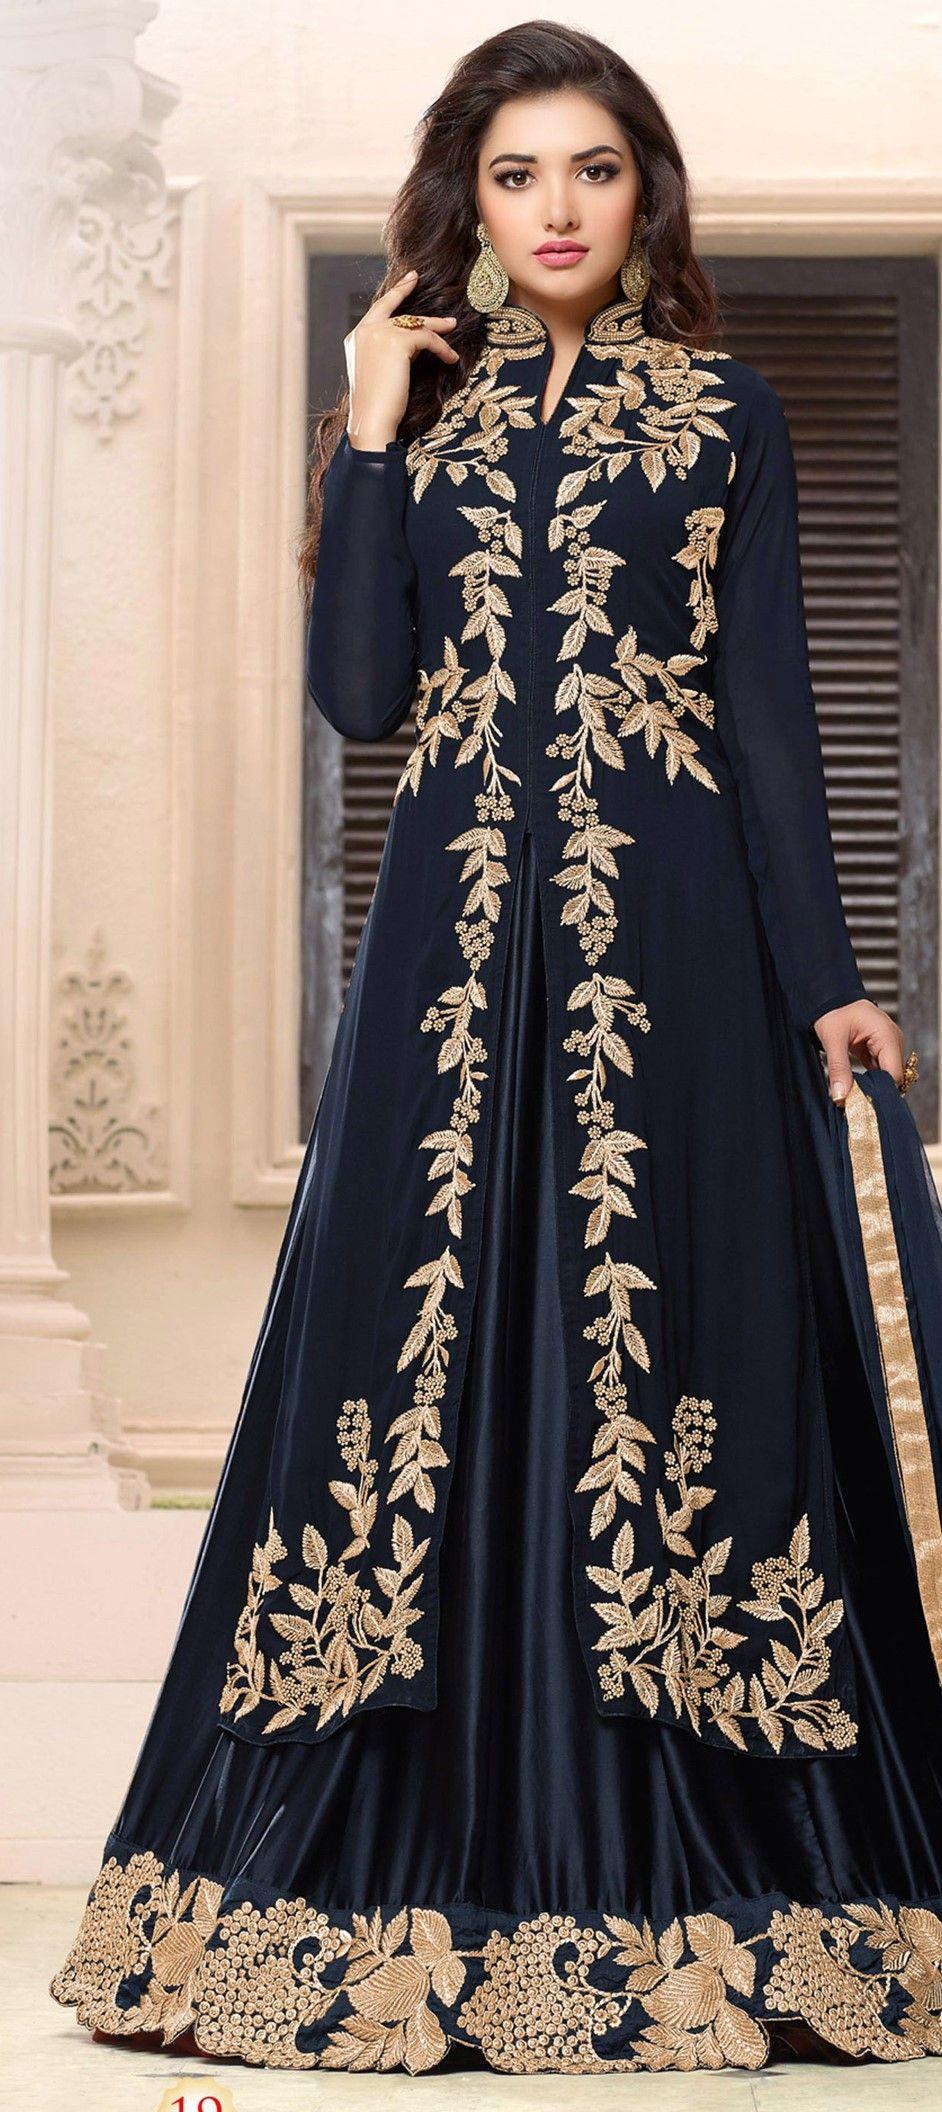 4a9ec8c344 490542: Black and Grey color family stitched Party Wear Salwar Kameez .